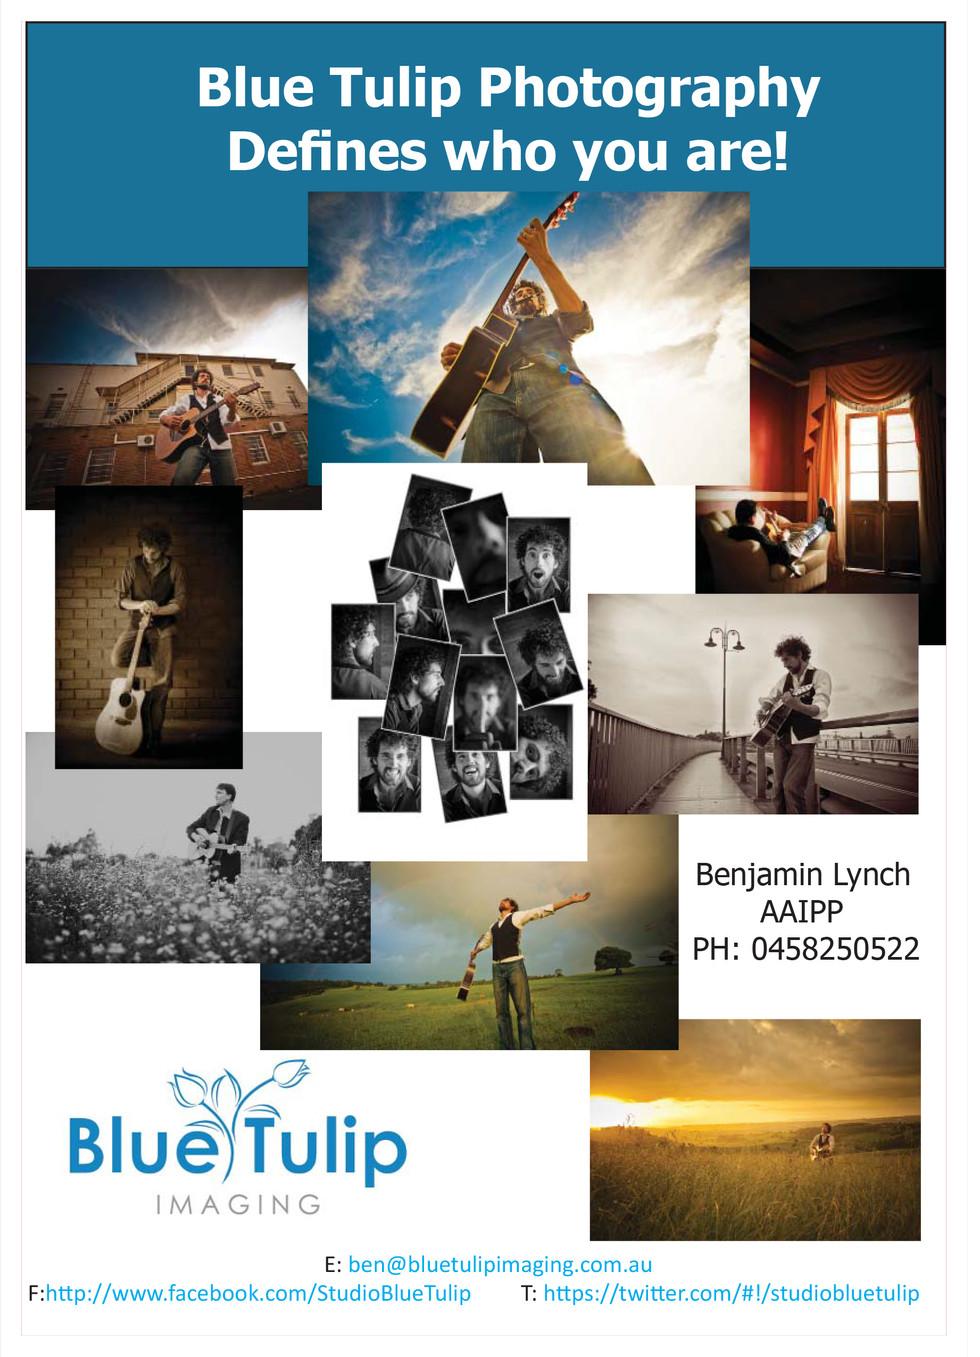 Blue Tulip Photography